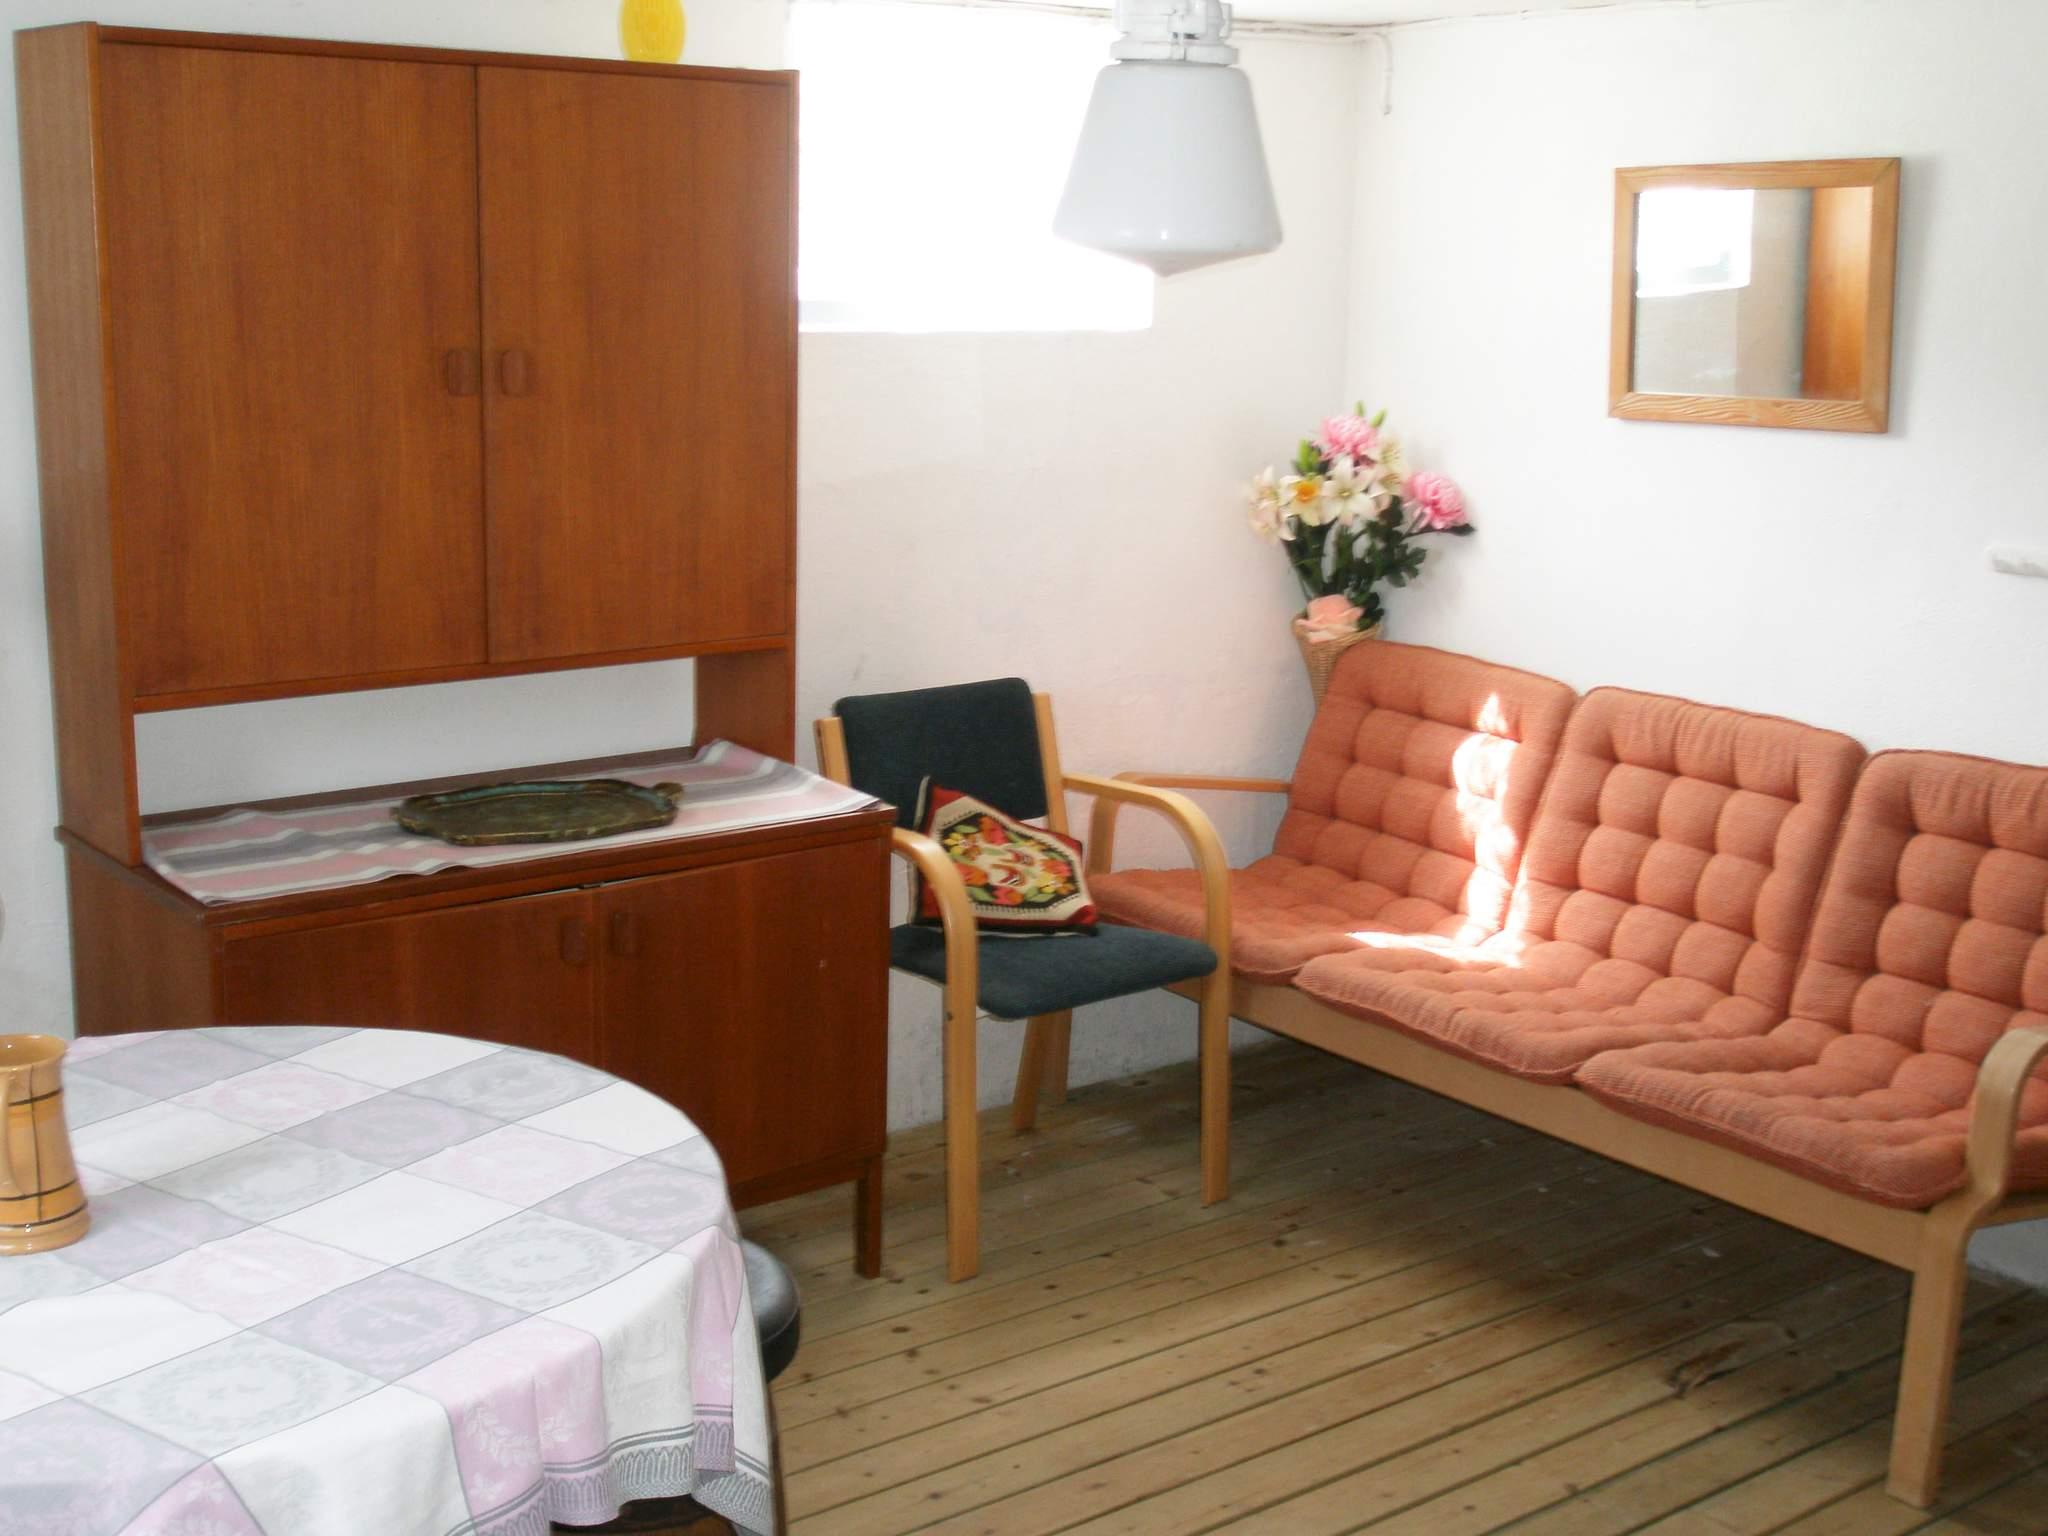 Ferienhaus Sundhultsbrunn (87123), Sunhultsbrunn, Jönköpings län, Südschweden, Schweden, Bild 6